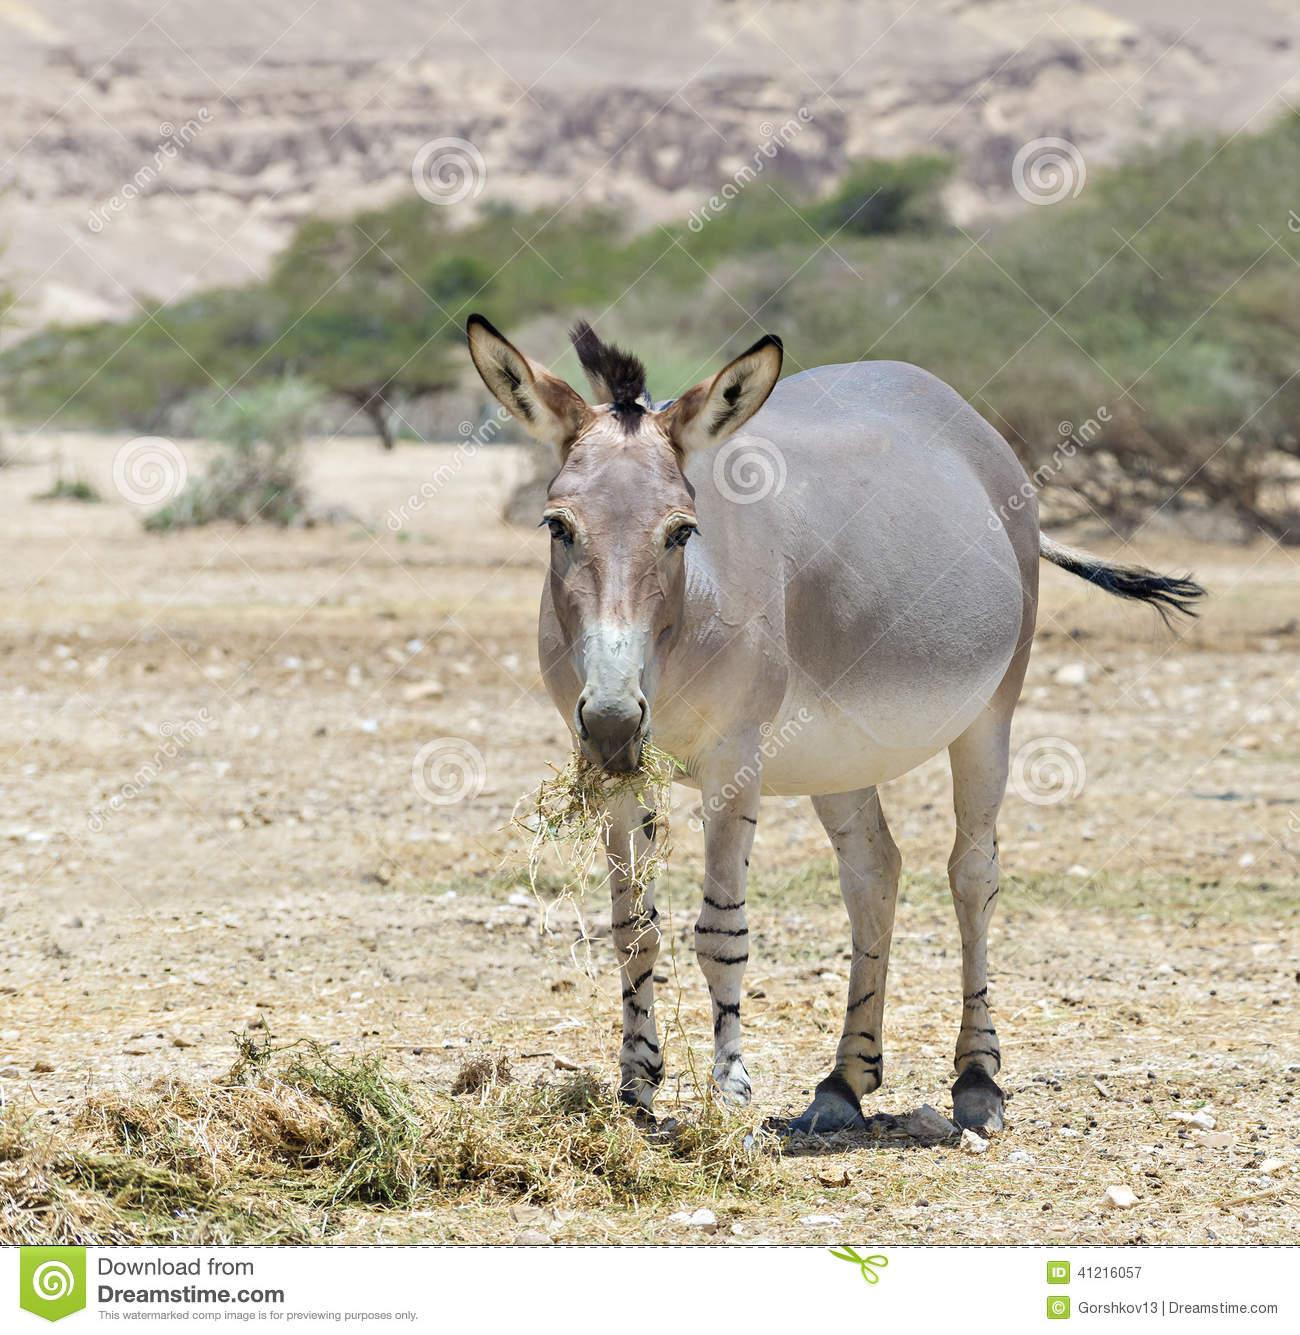 Somali wild ass clipart #20